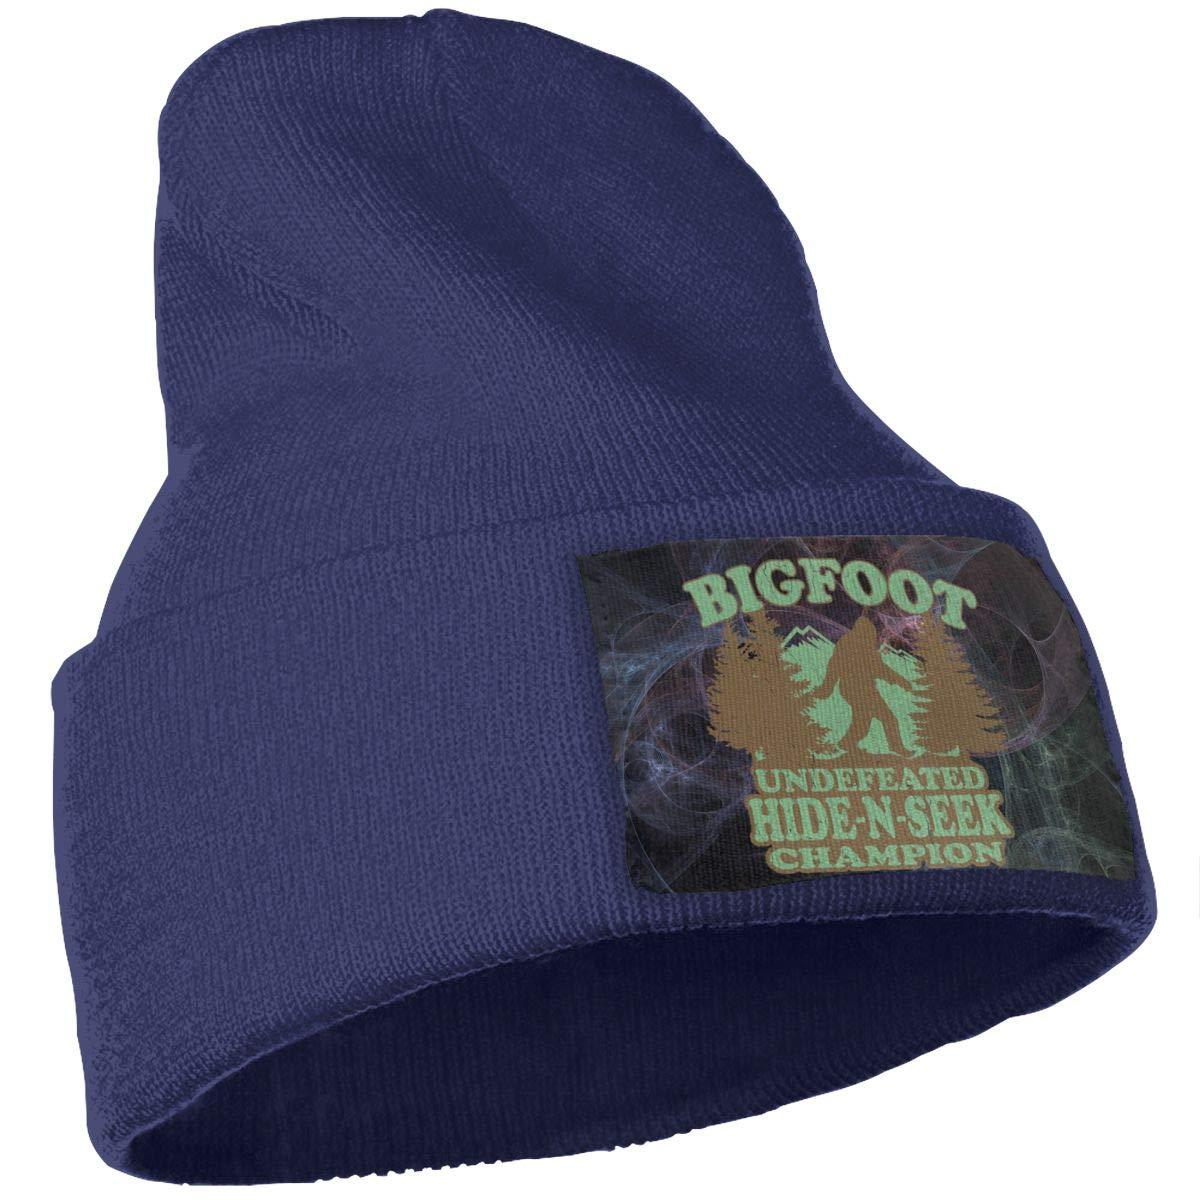 Bigfoot Undefeated Hide and Seek Champion Beanies Hat Wool Skull Cap Unisex